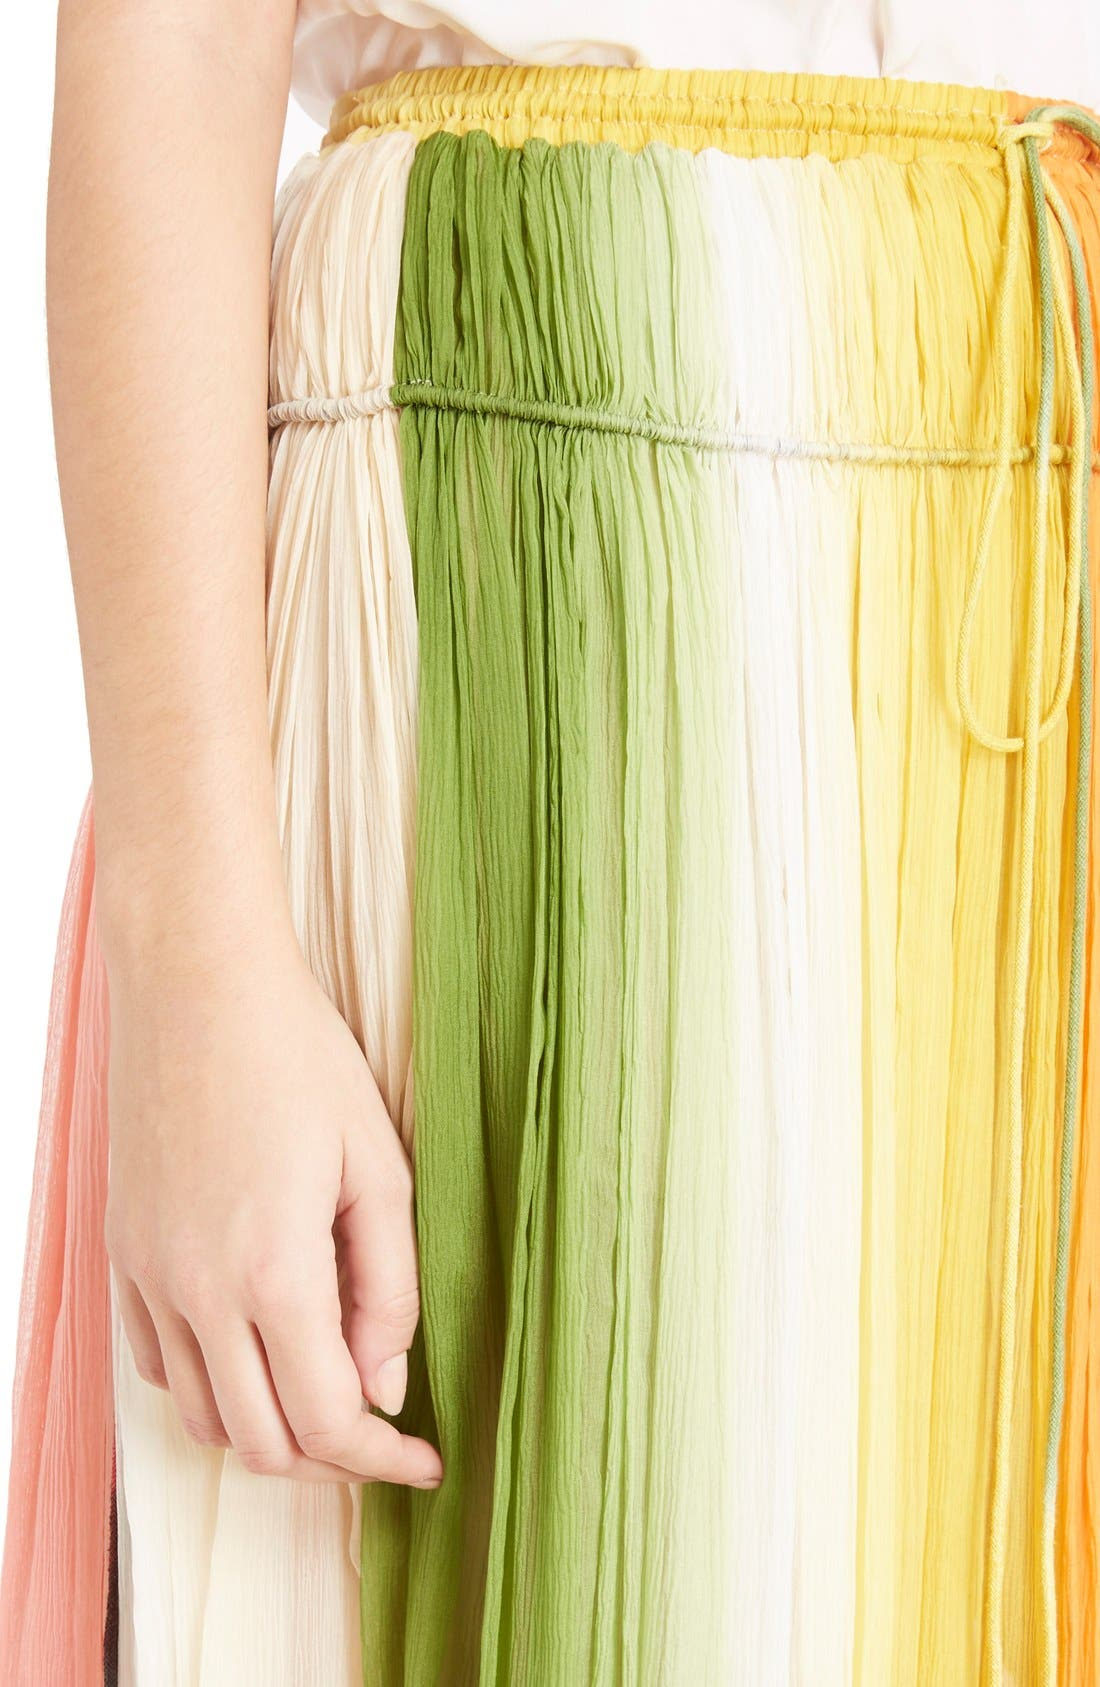 Stripe Pleated Silk Skirt with Tassels,                             Alternate thumbnail 6, color,                             Orange/ Green